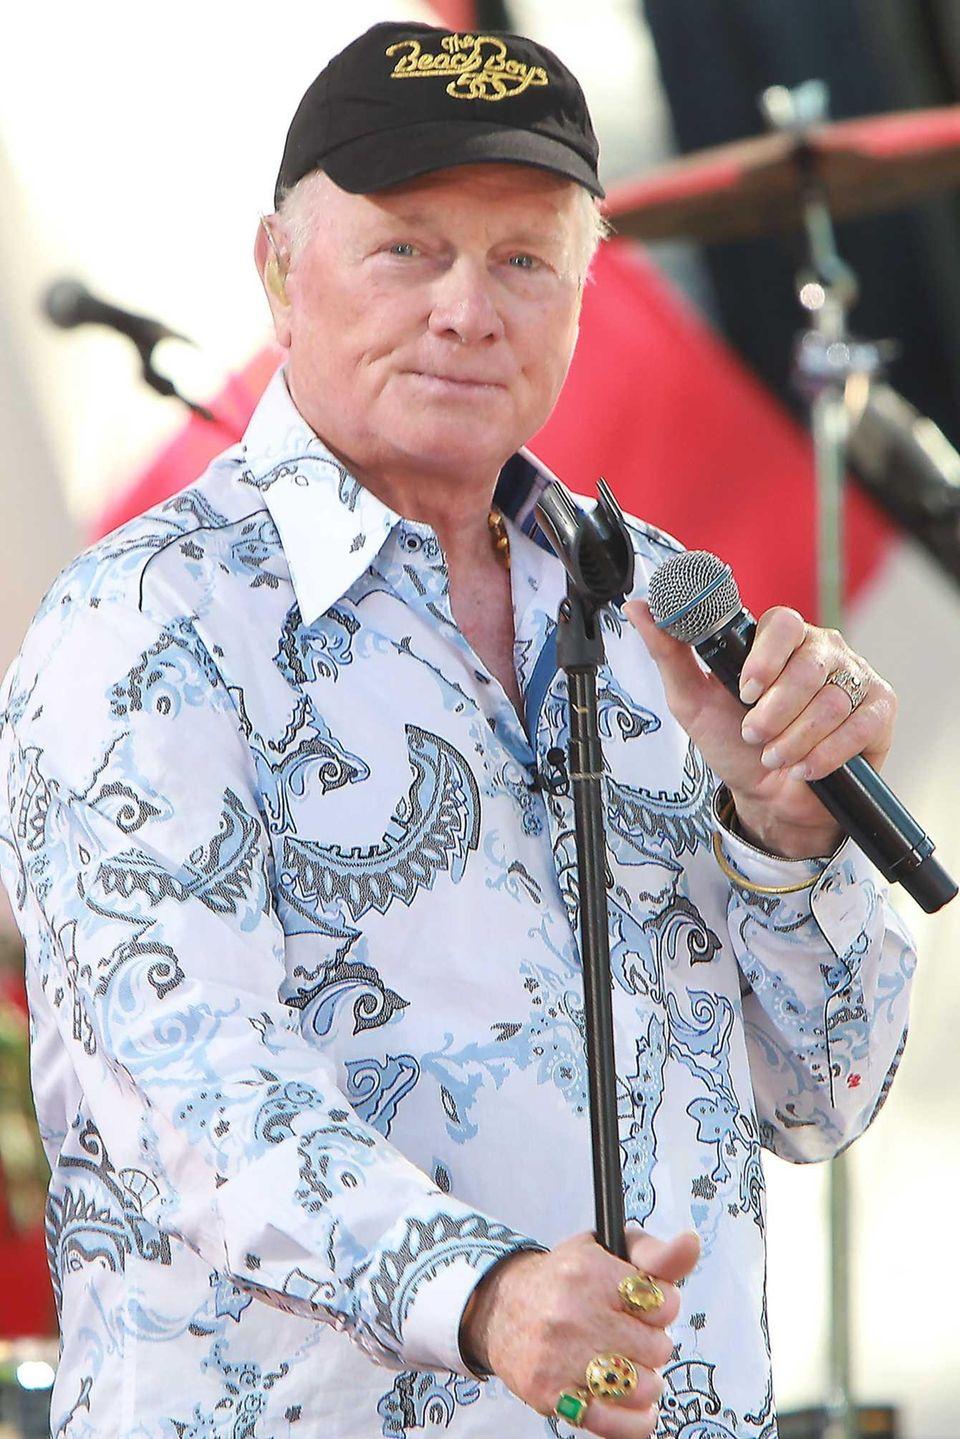 Mike Love of The Beach Boys as the